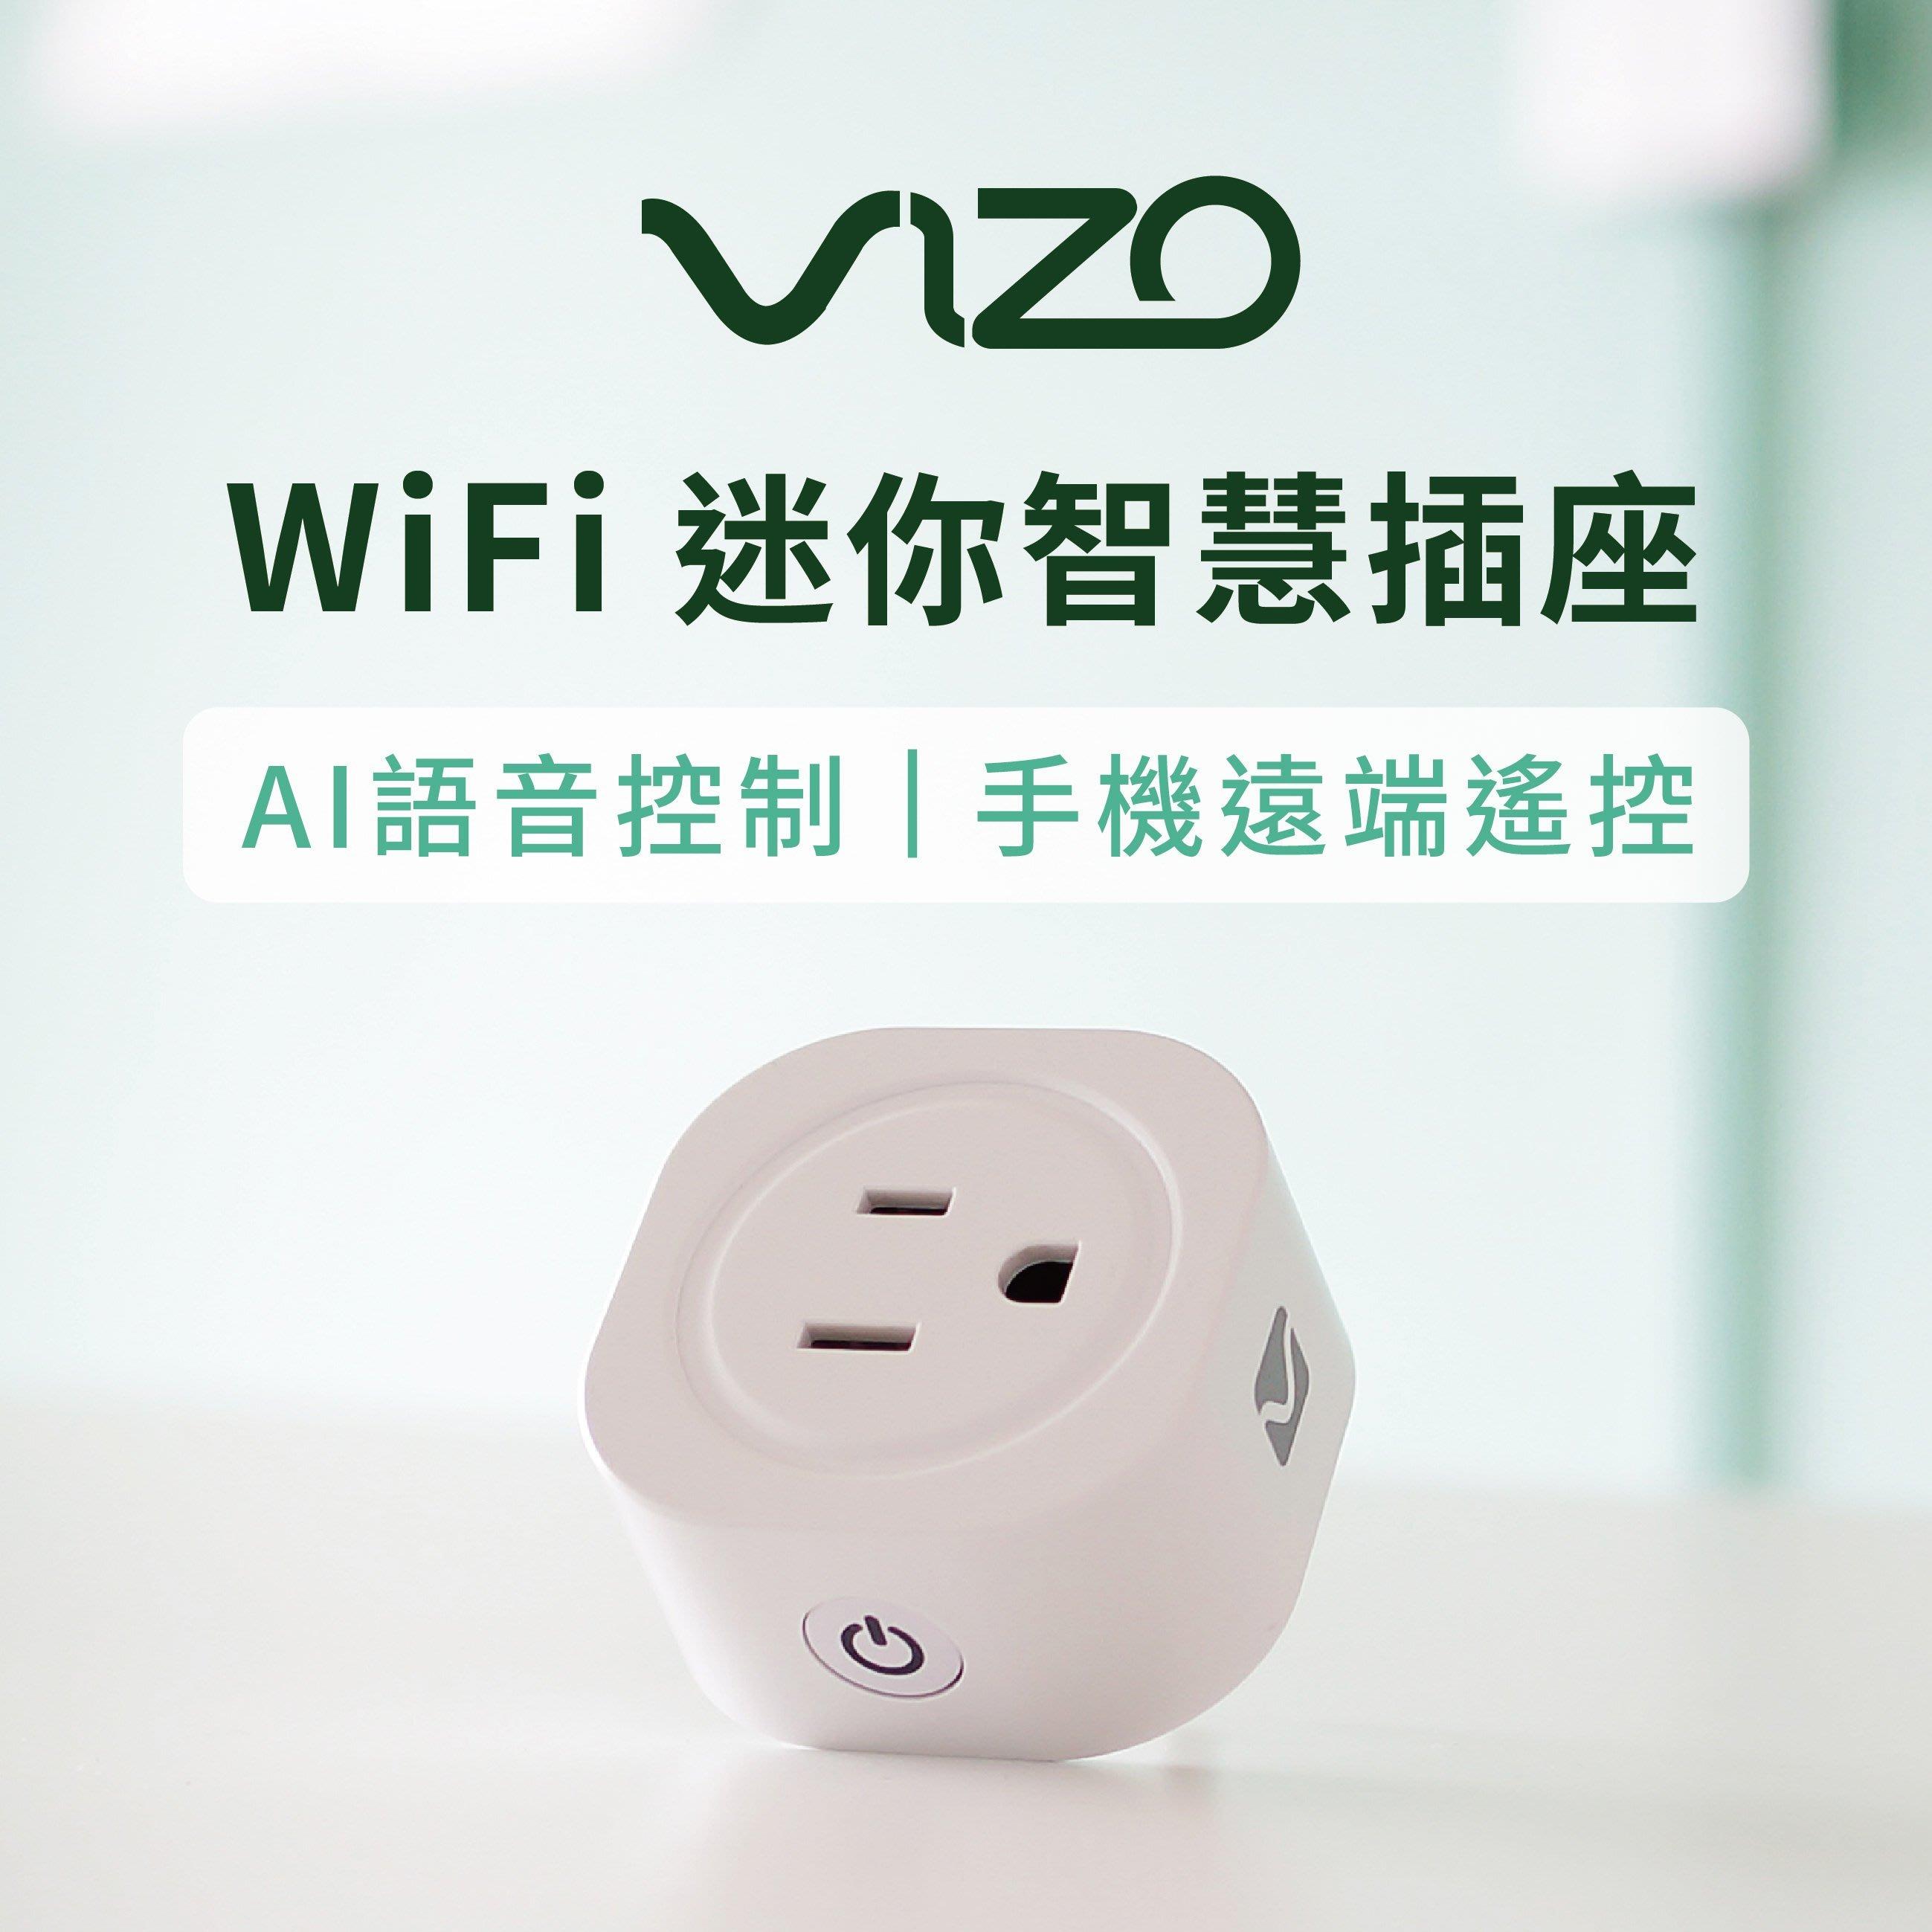 [VIZO弈碩智能] WiFi 迷你智慧插座 遠端遙控 插座定時器 倒數計時器 智慧插座 語音聲控 Alexa 谷歌